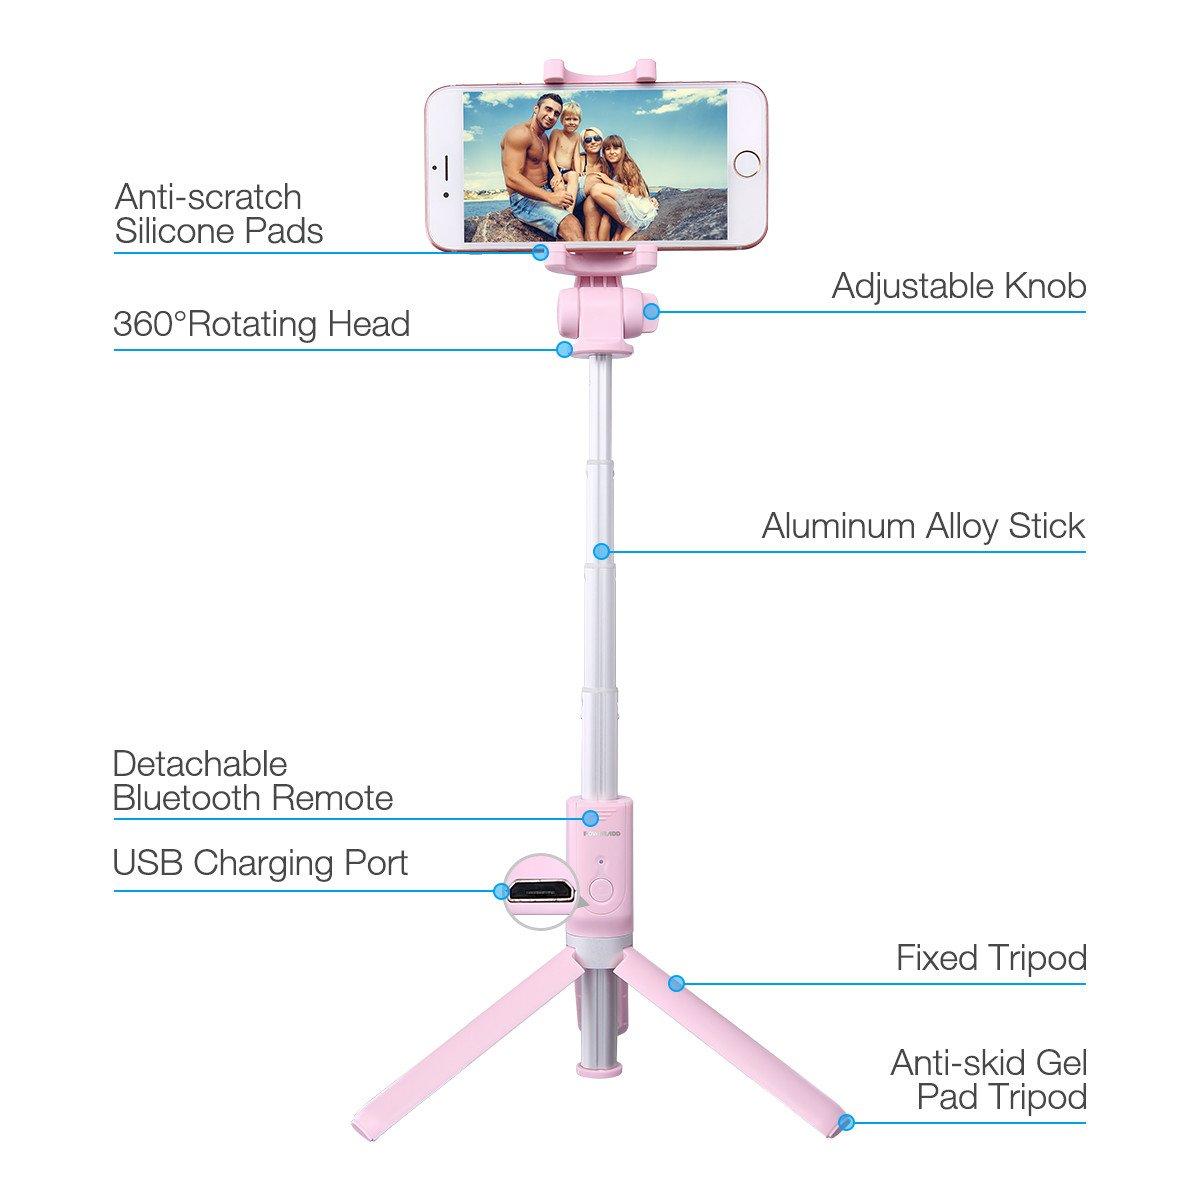 Selfie Stick Tripod,Poweradd Extendable/Foldable Aluminum Selfie Stick with Detachable/Wireless Remote for iPhone X/SE/6/6s/6 Plus/7/7 Plus/8/8 Plus/,Samsung 8/S8/S8 Plus,Nexus,LG,Moto and More-Pink by POWERADD (Image #2)